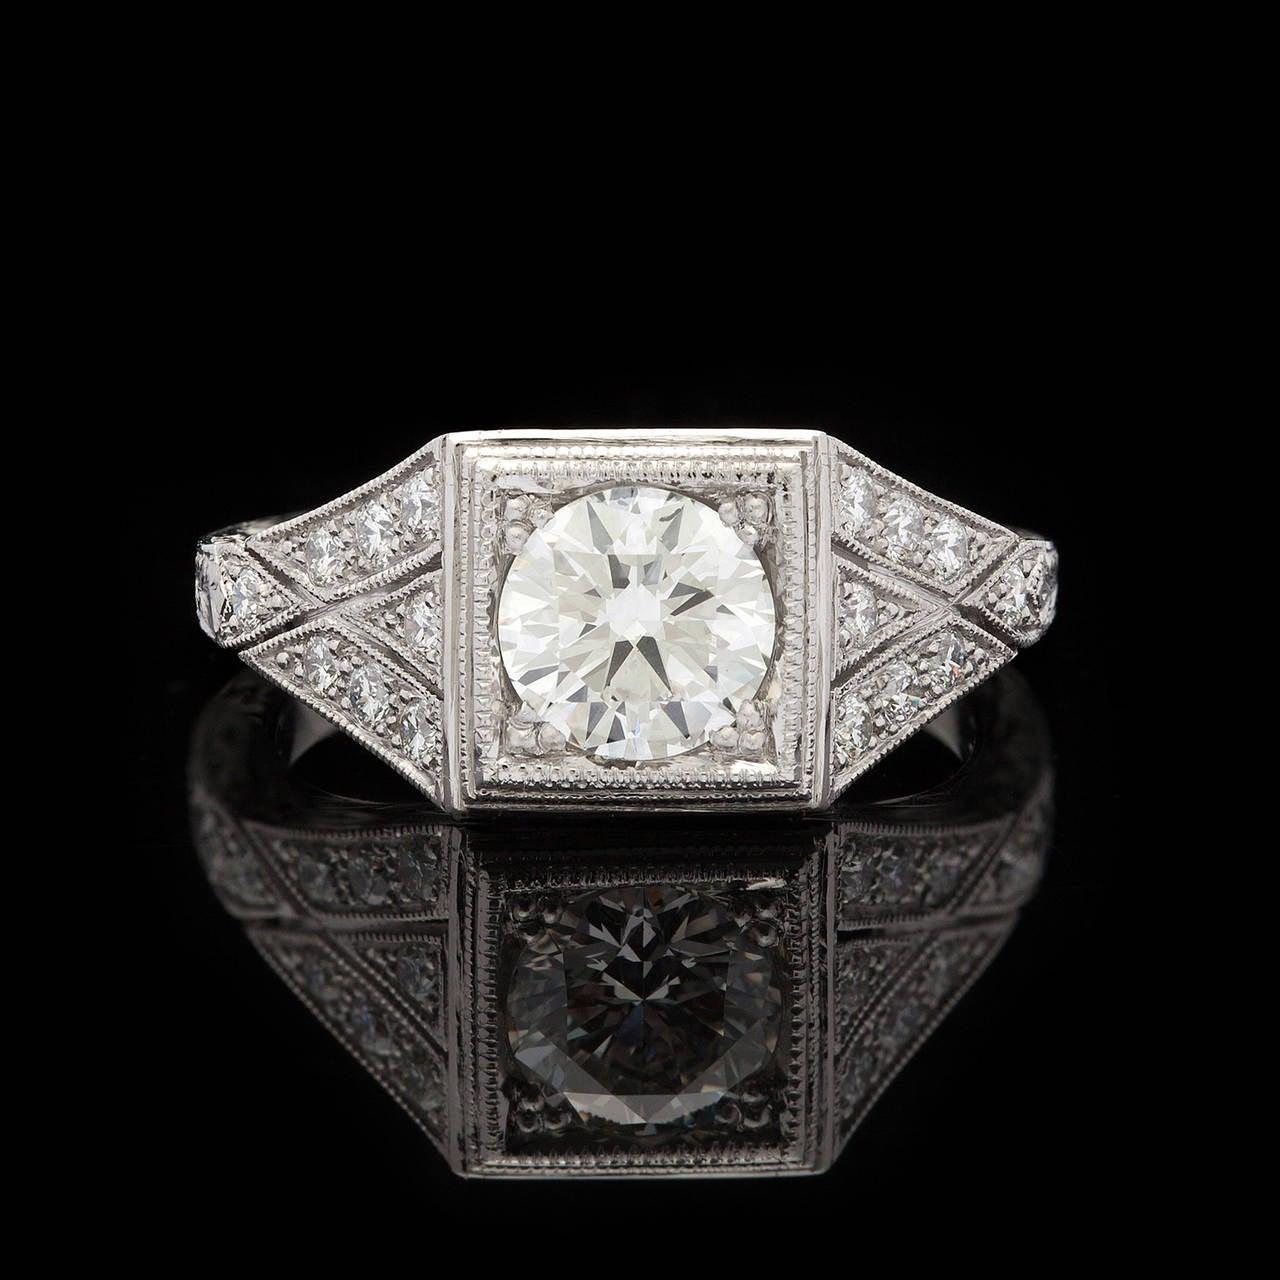 Edwardian 1.05 Carat GIA Certified Diamond Platinum Ring For Sale